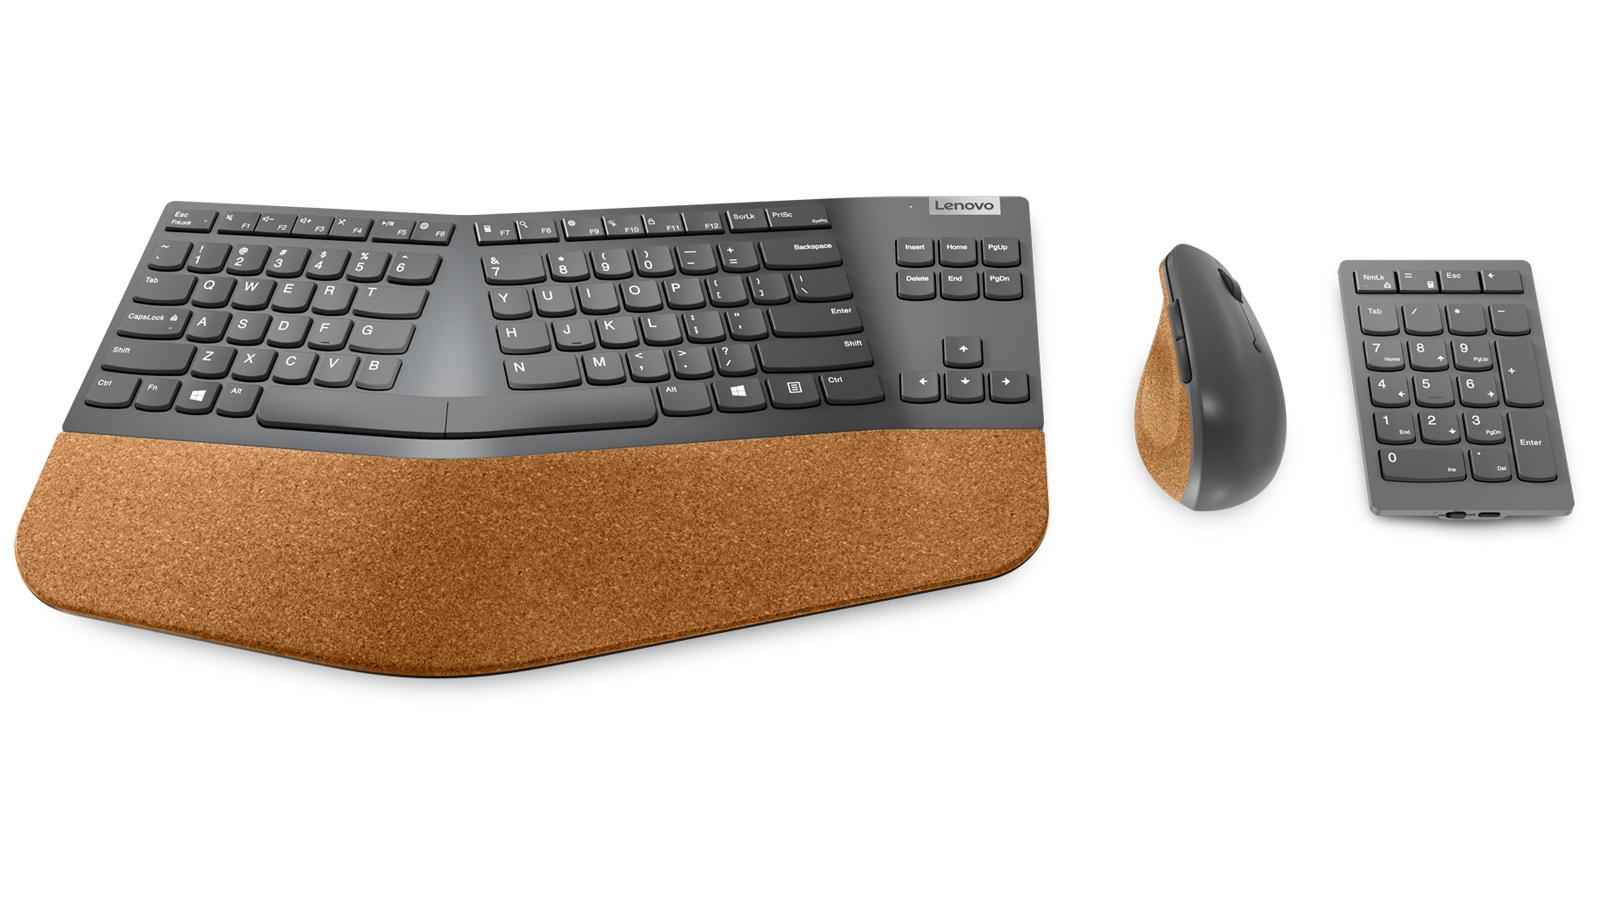 Lenovo Go Wireless Split Keyboard, Wireless Vertical Mouse, and Wireless Numeric Keypad